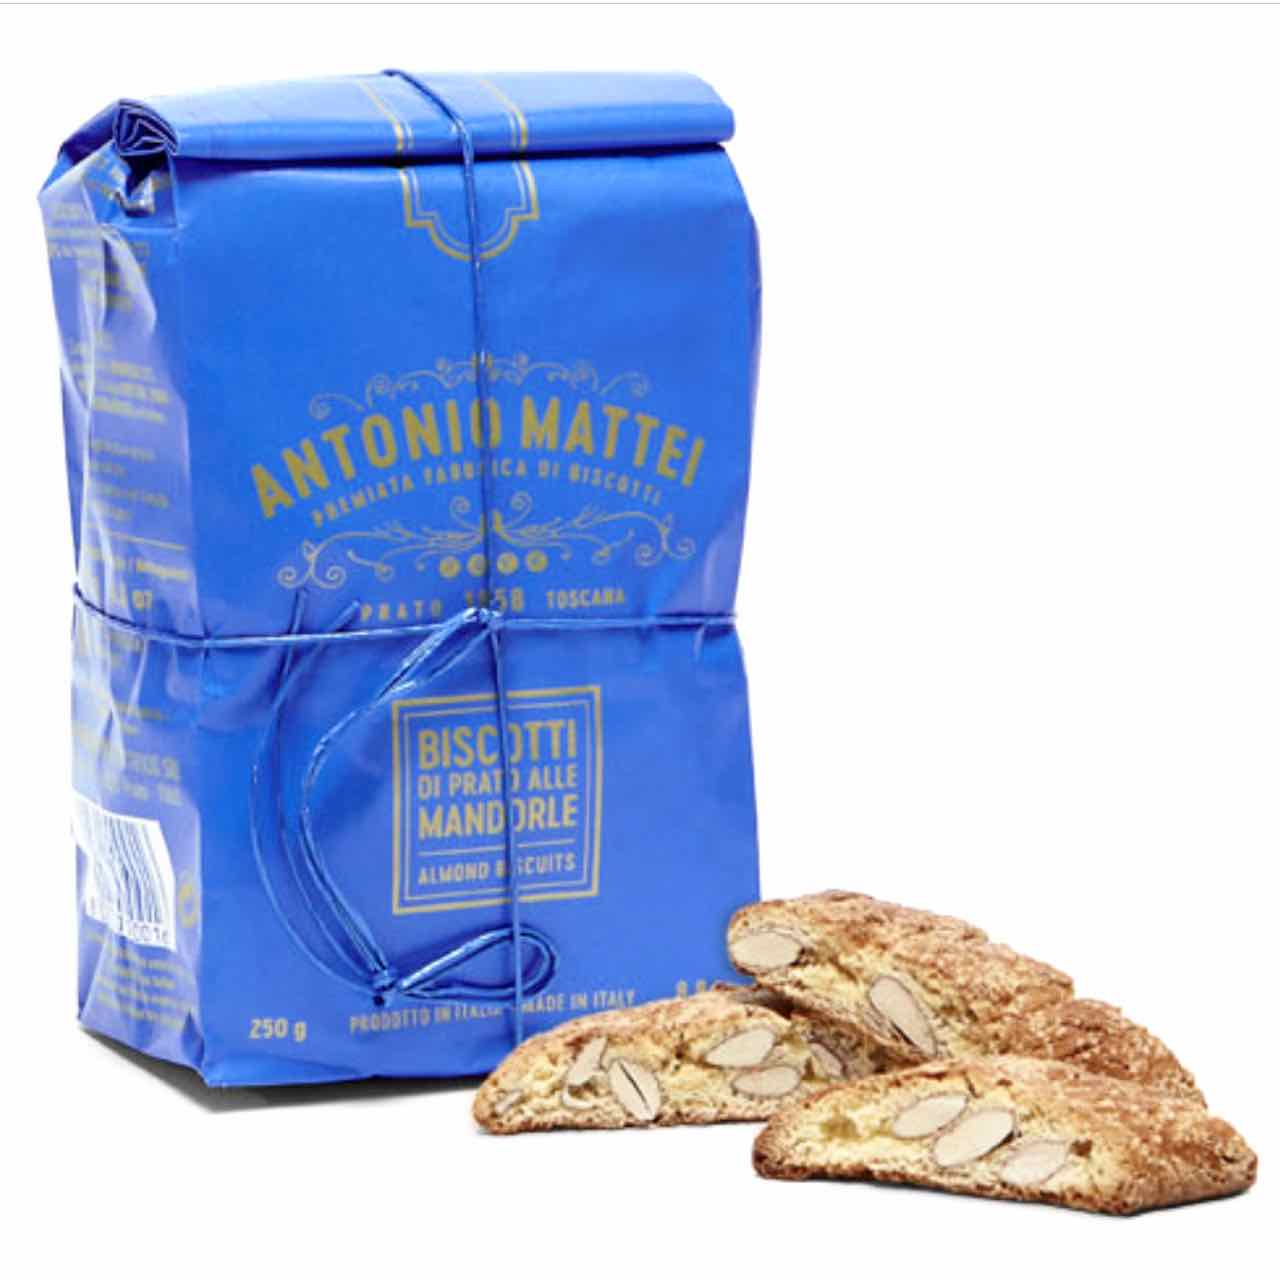 Biscotti di Prato Antonio Mattei – Gustorotondo – spesa online-  Gustorotondo online shop – i migliori cibi online – vendita online dei migliori cibi italiani artigianali